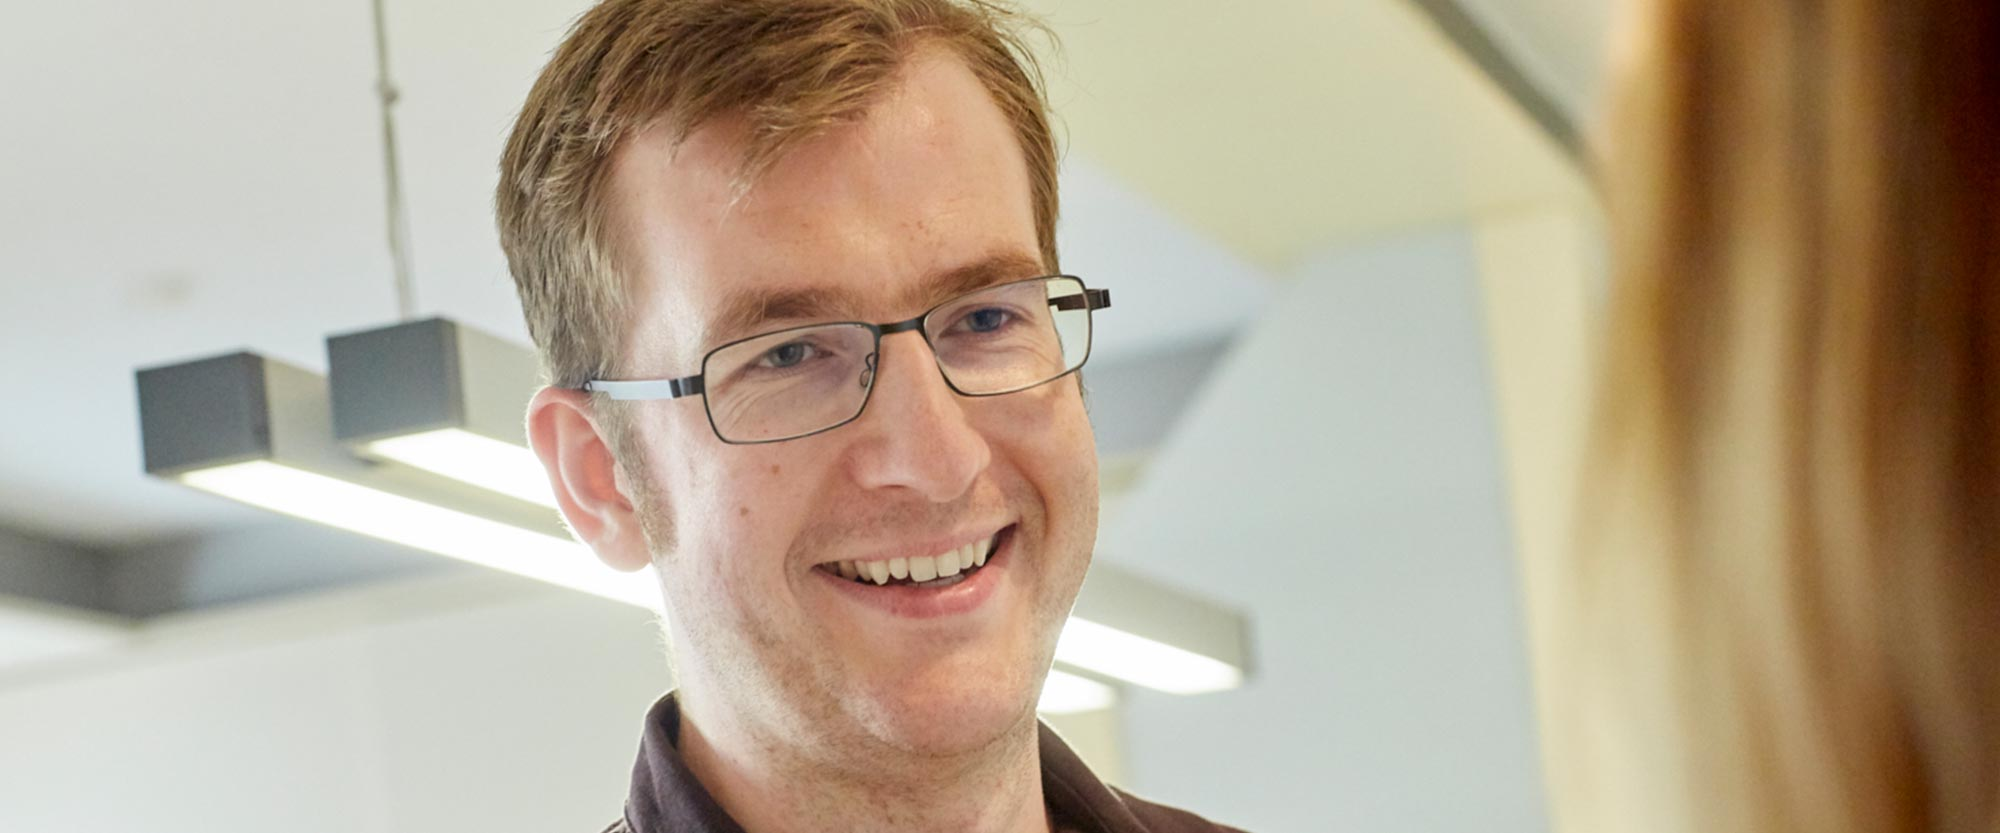 Zahnarzt und Implantologe Lennard Bertram aus Leer